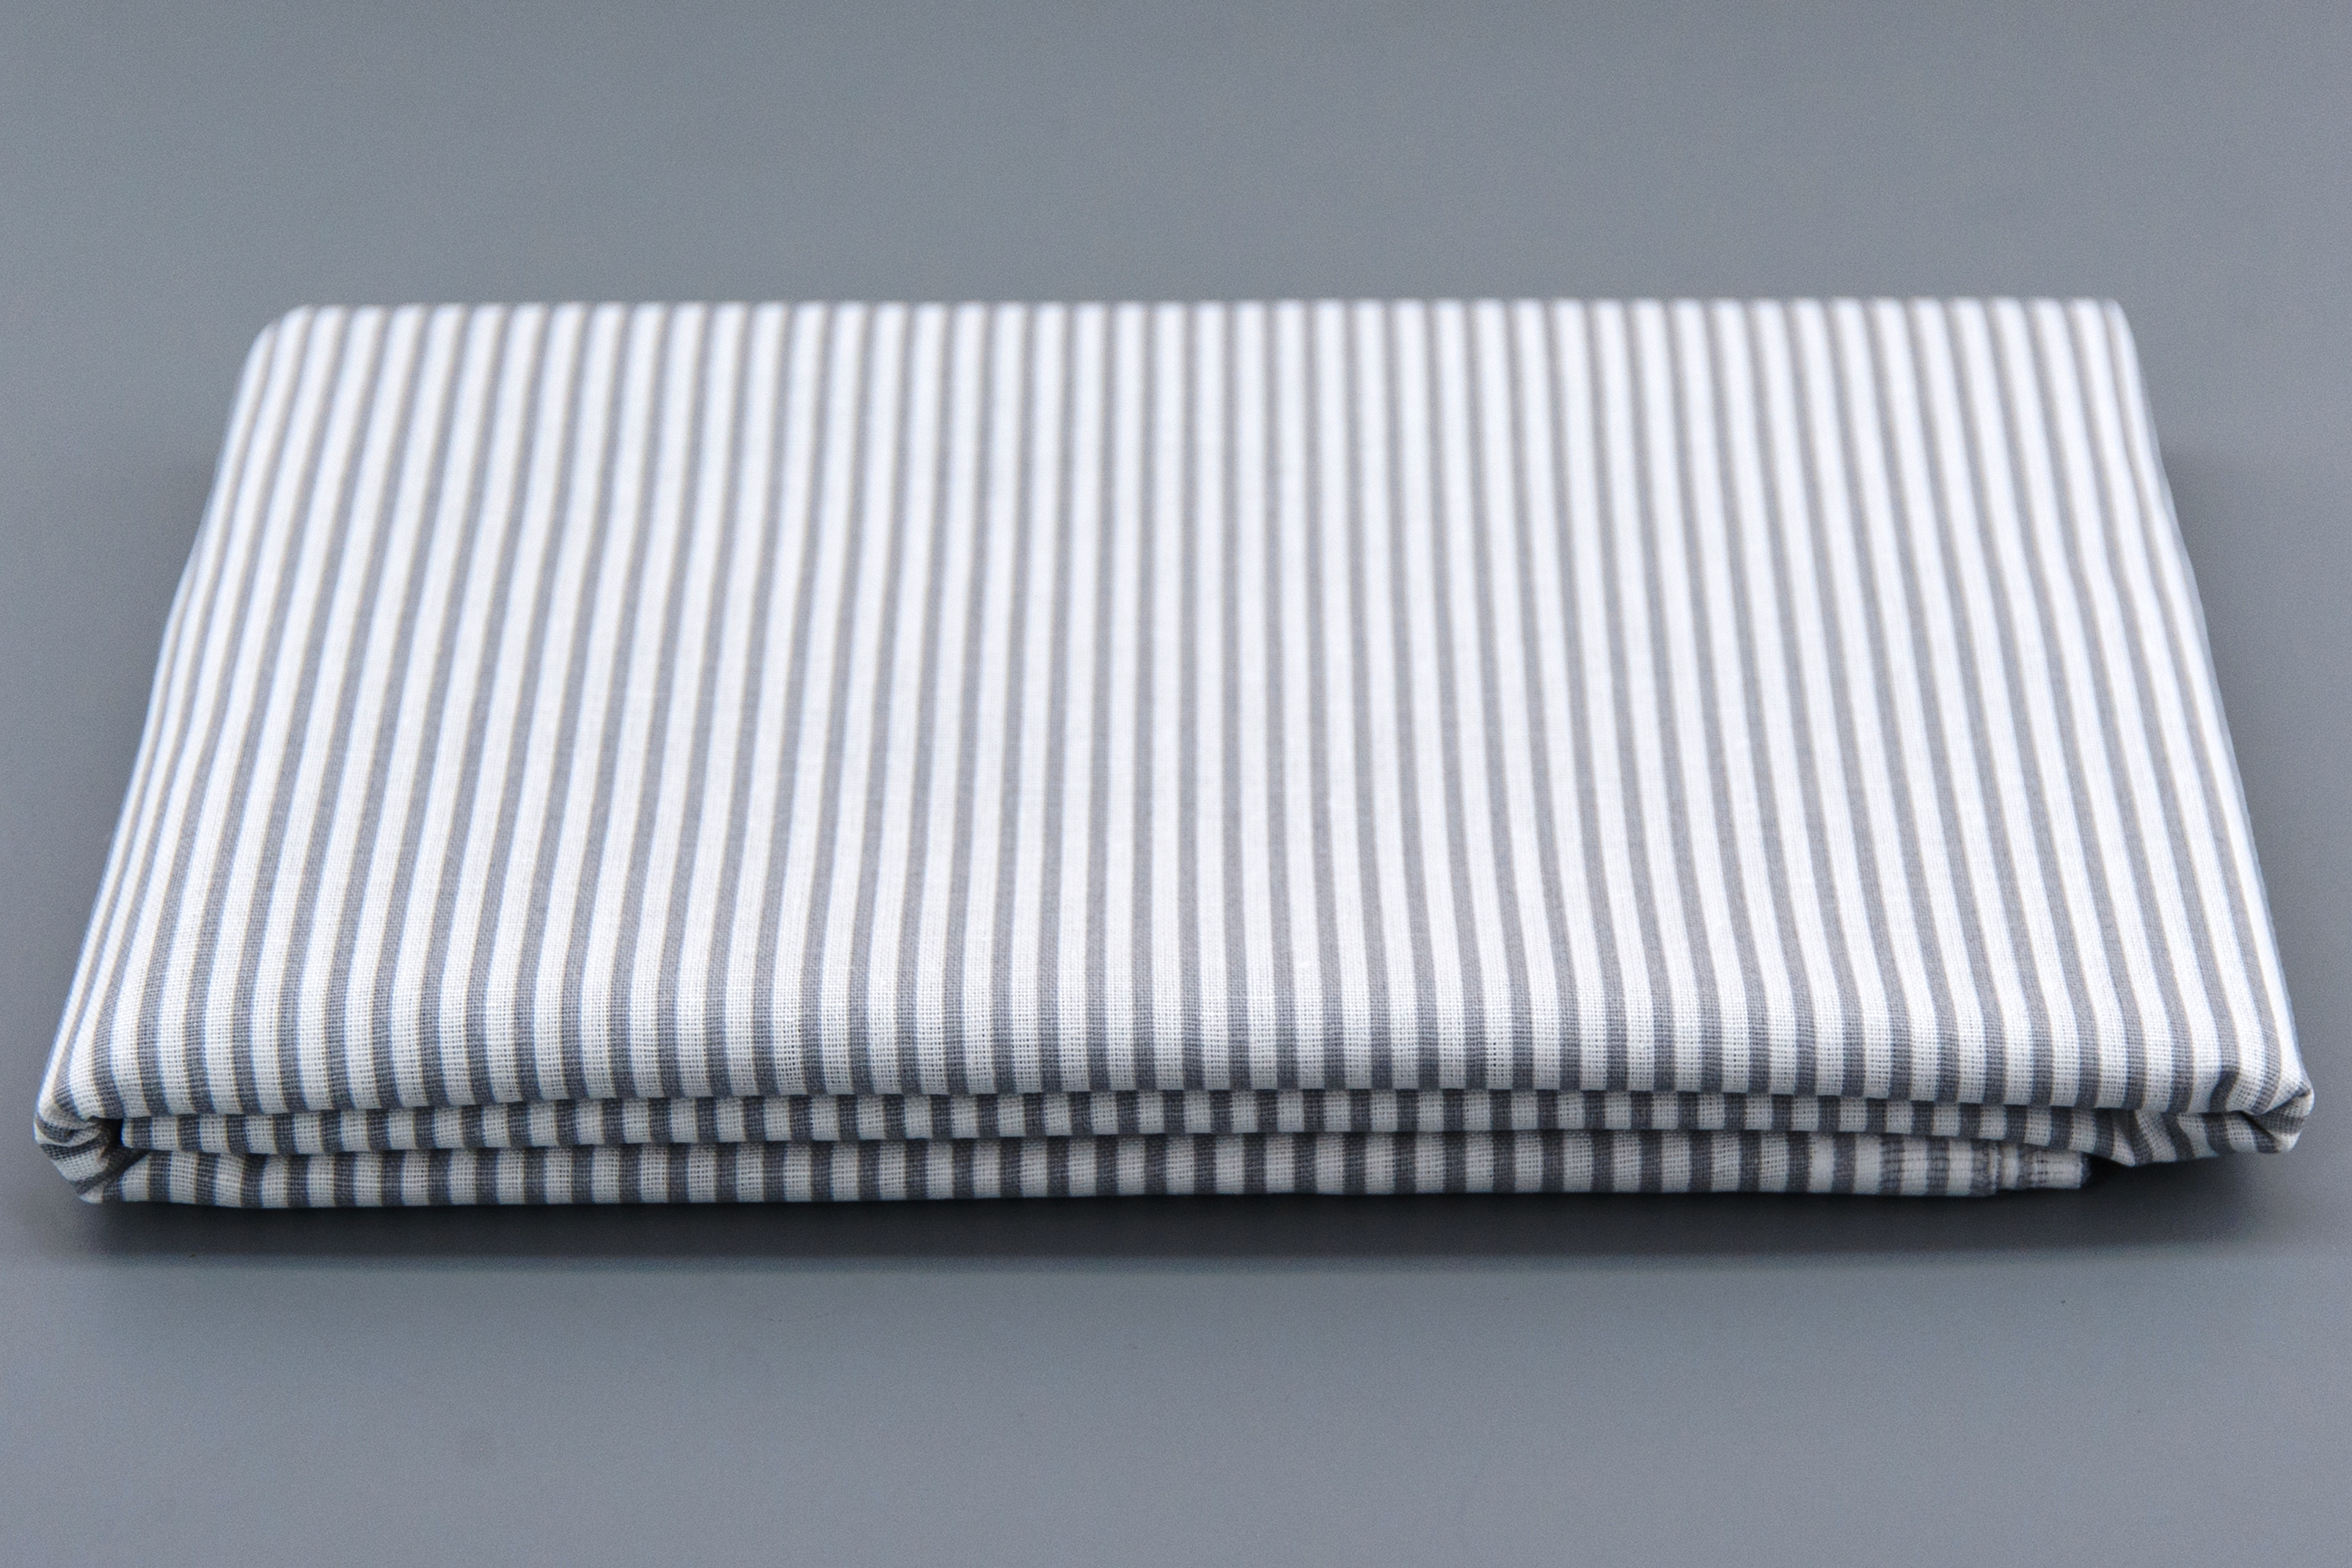 Ткань КИСЕЯ МОД 150Х150BZ1663/17Ткань для рукоделия, продается отрезом 1,5 х 1,5 метра. Состав: 100% хлопок. Плотность - 120 гр./кв.м.